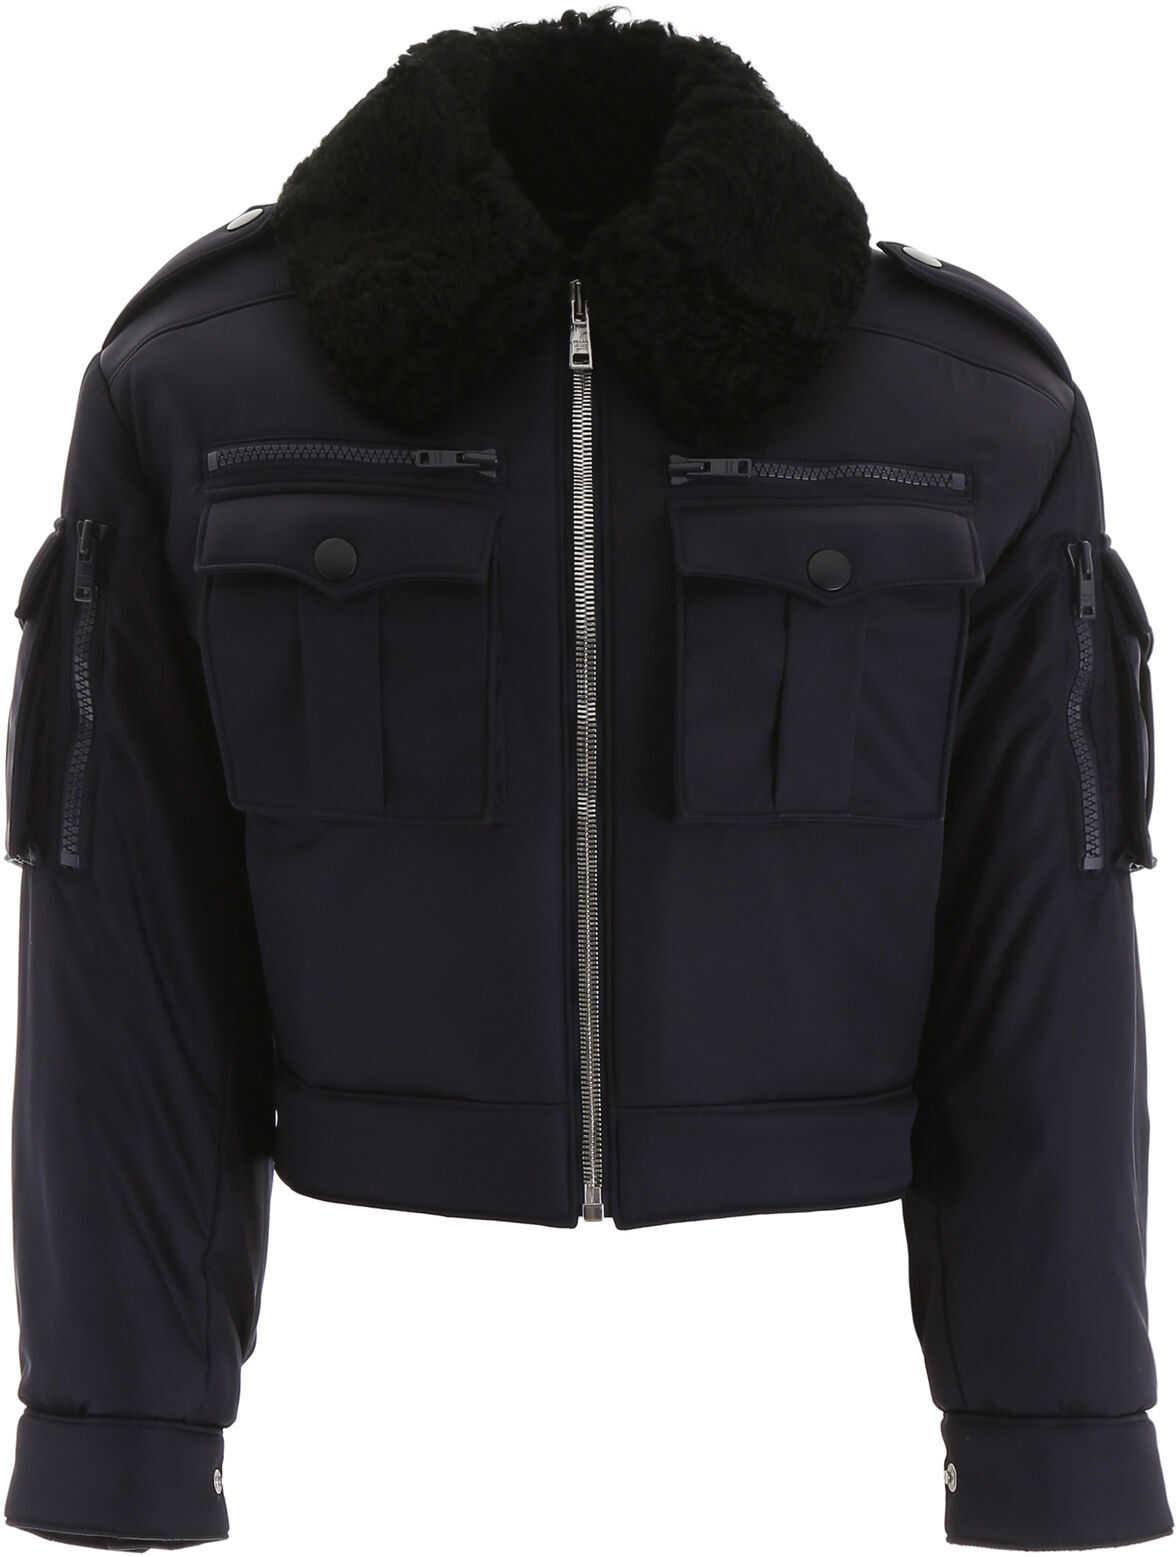 Prada Jacket With Shearling Collar NAVY